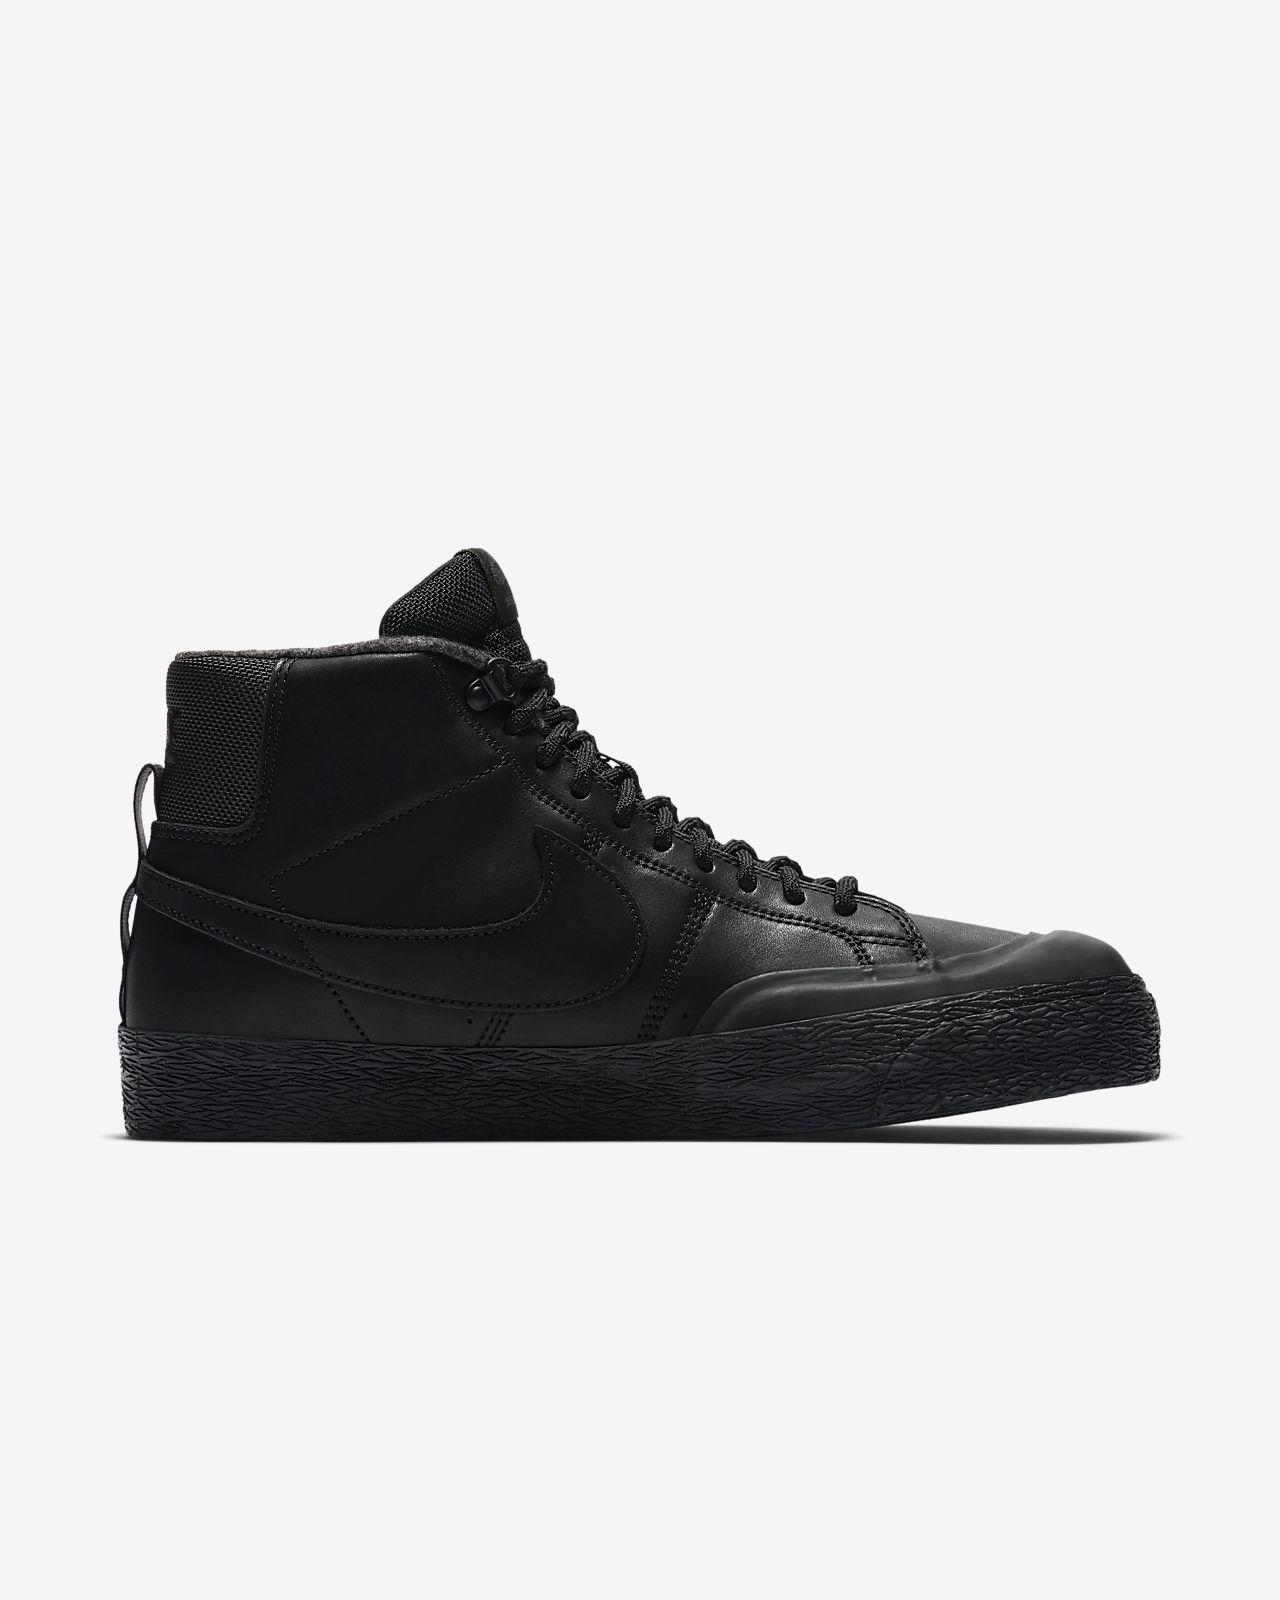 outlet Manchester free shipping new styles Nike Men's SB Zoom Blazer Mid De... clearance footlocker fashion Style sbNBYuGL